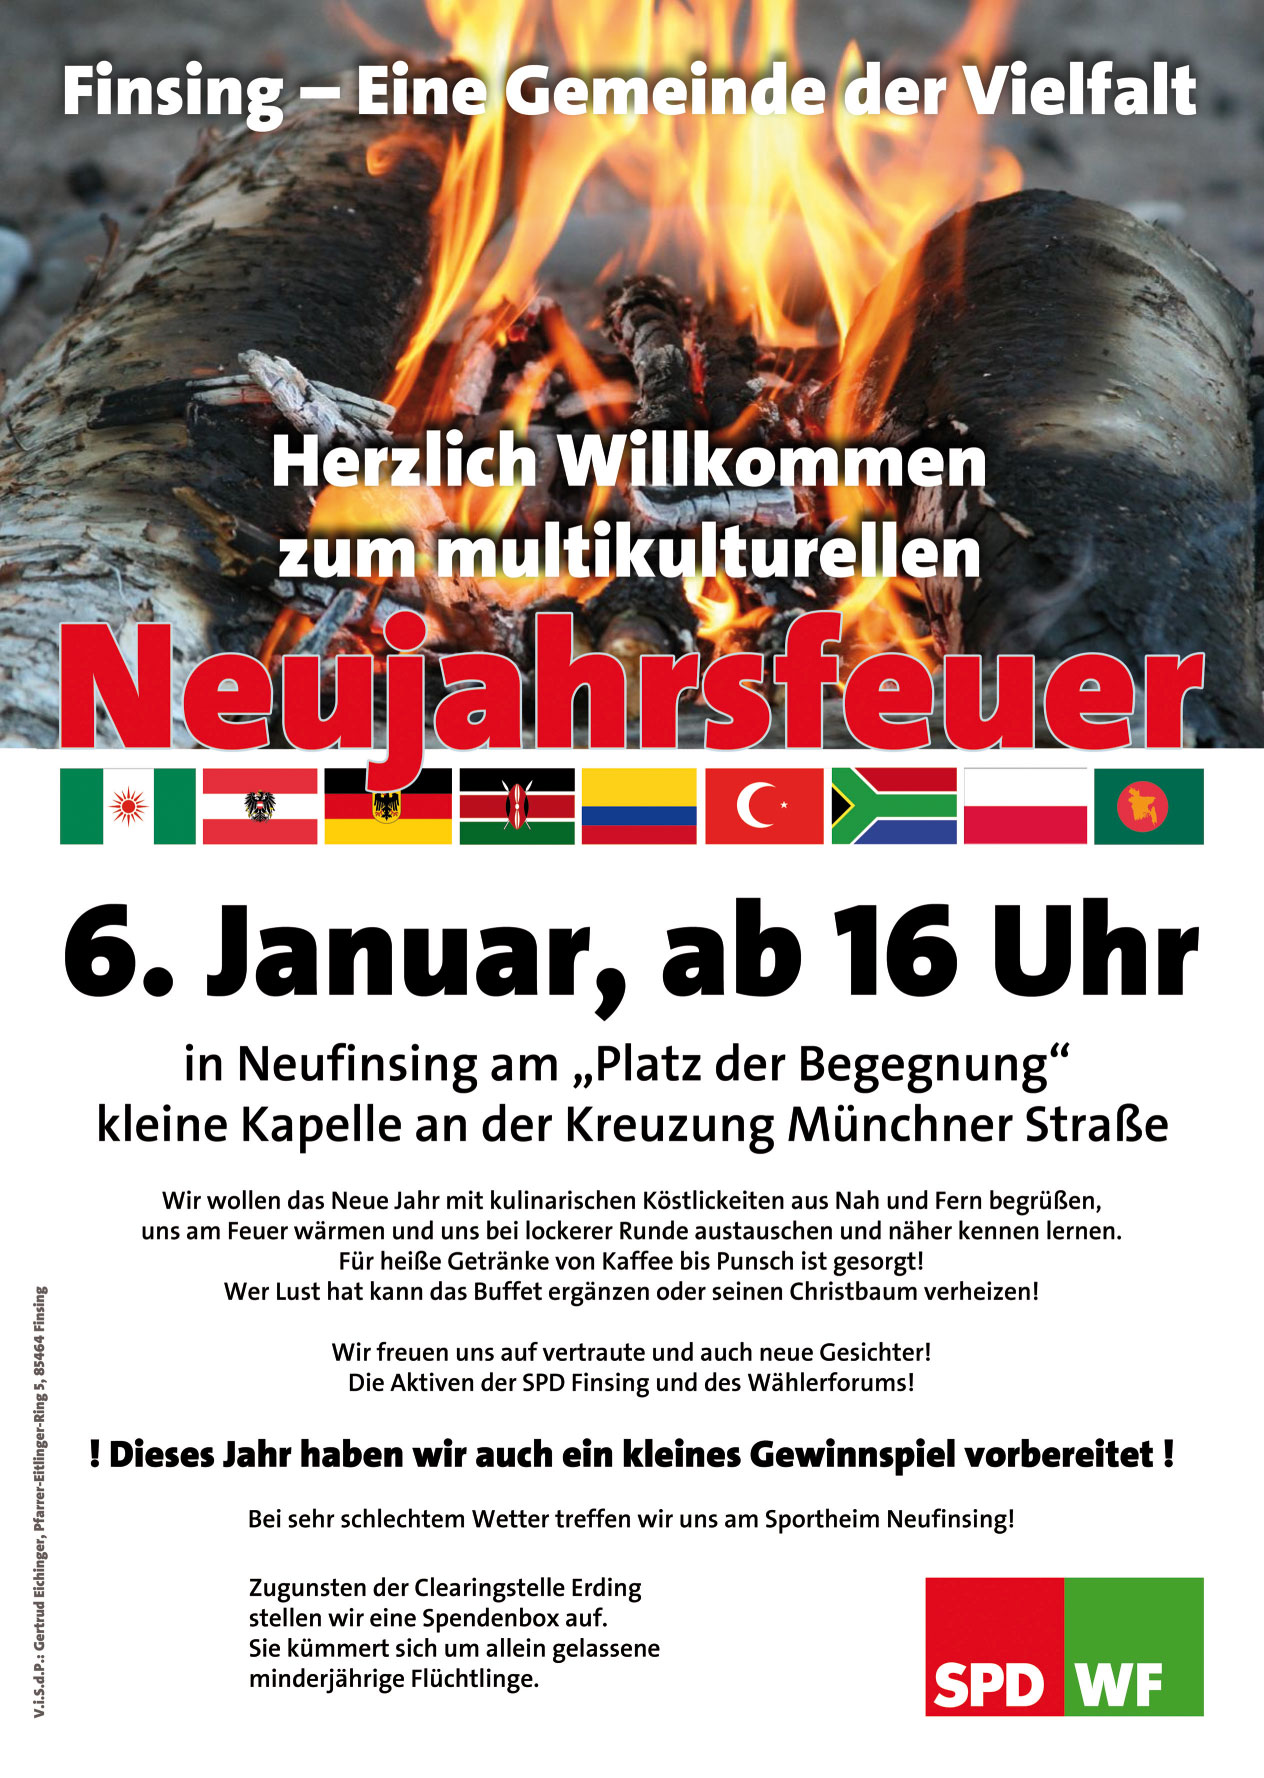 Neujahrsfeuer in Neufinsing am 06.01.2014